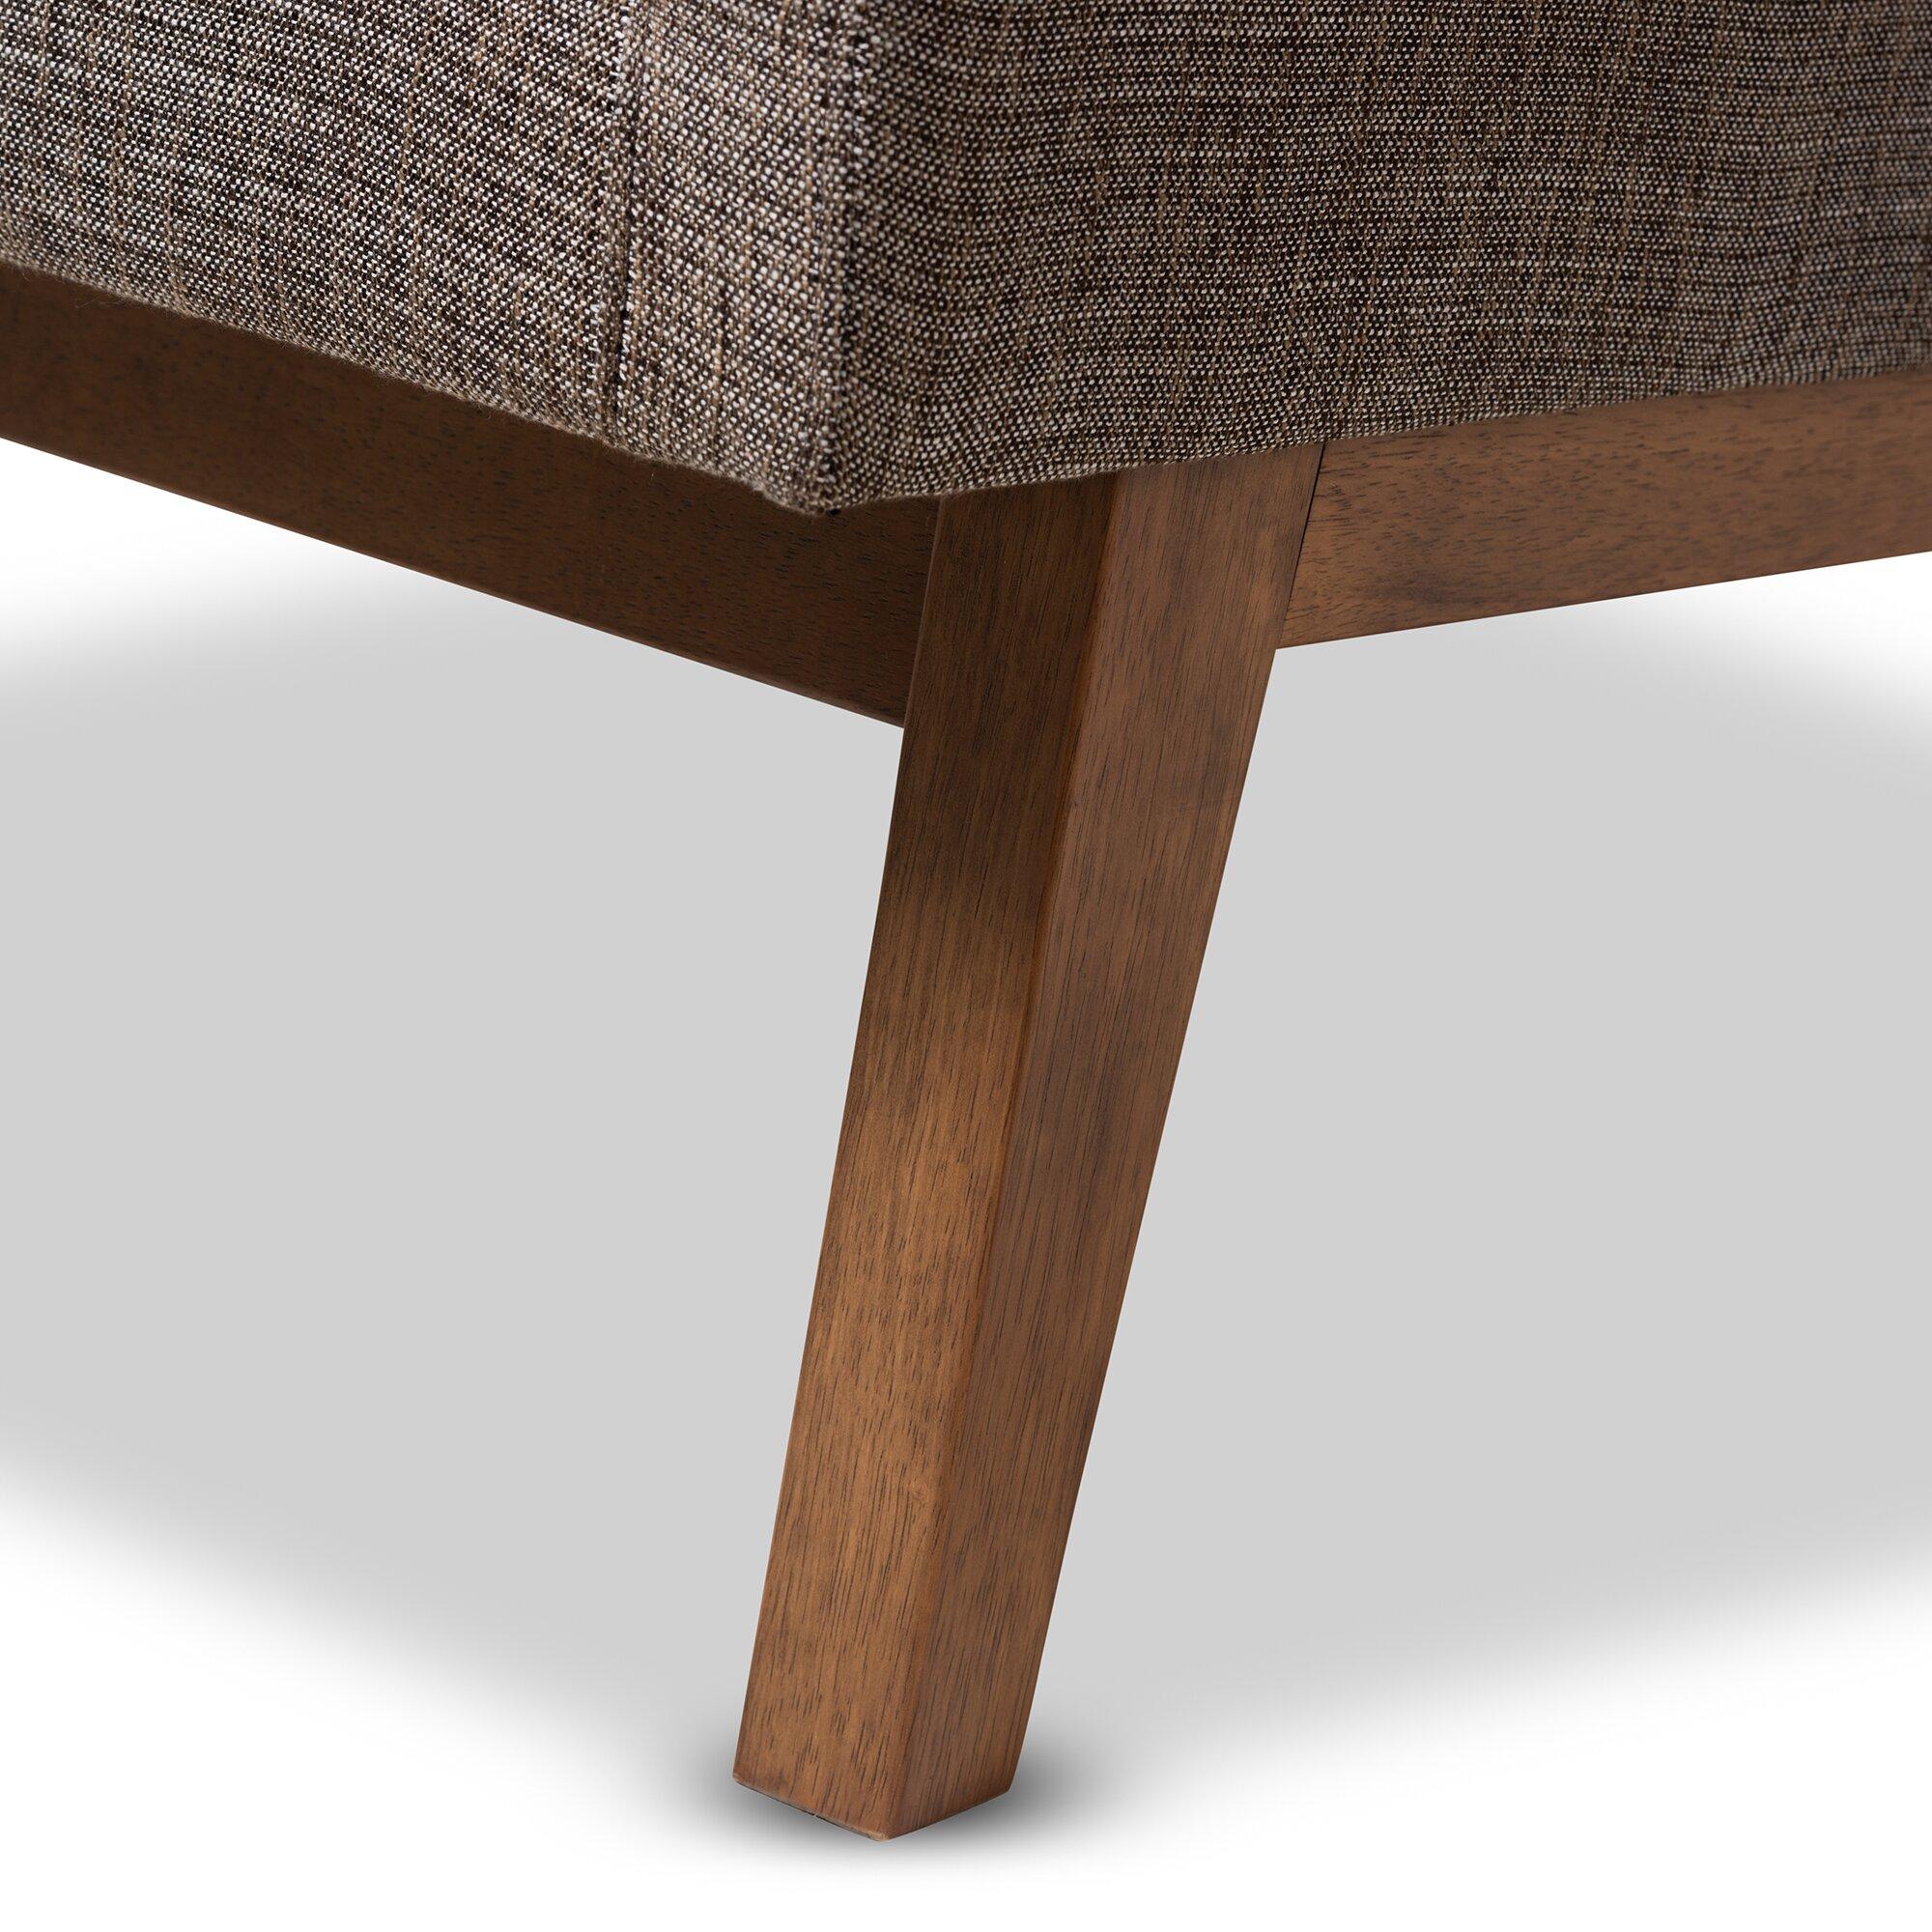 wholesale interiors baxton studio gerardo upholstered lounge chair and ottoman baxton studio lounge chair